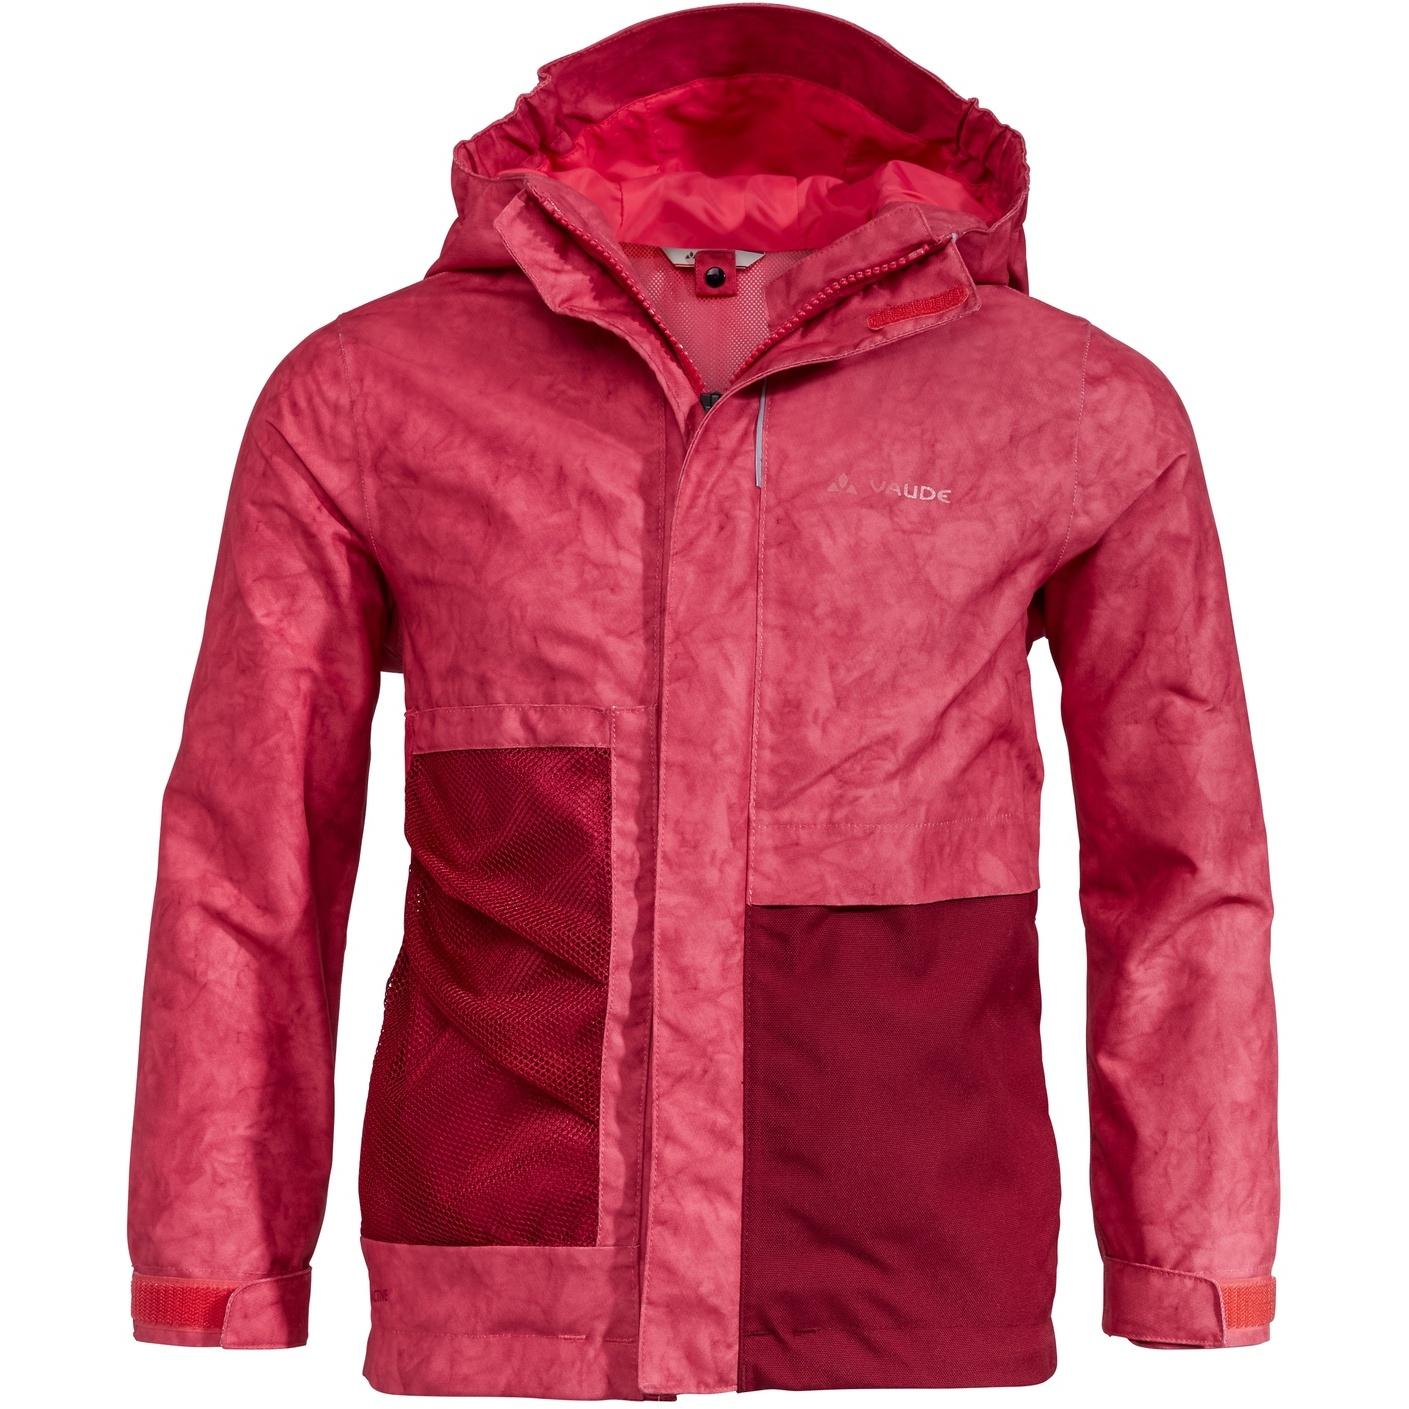 Vaude Kids Faunus 2L Jacke - bright pink